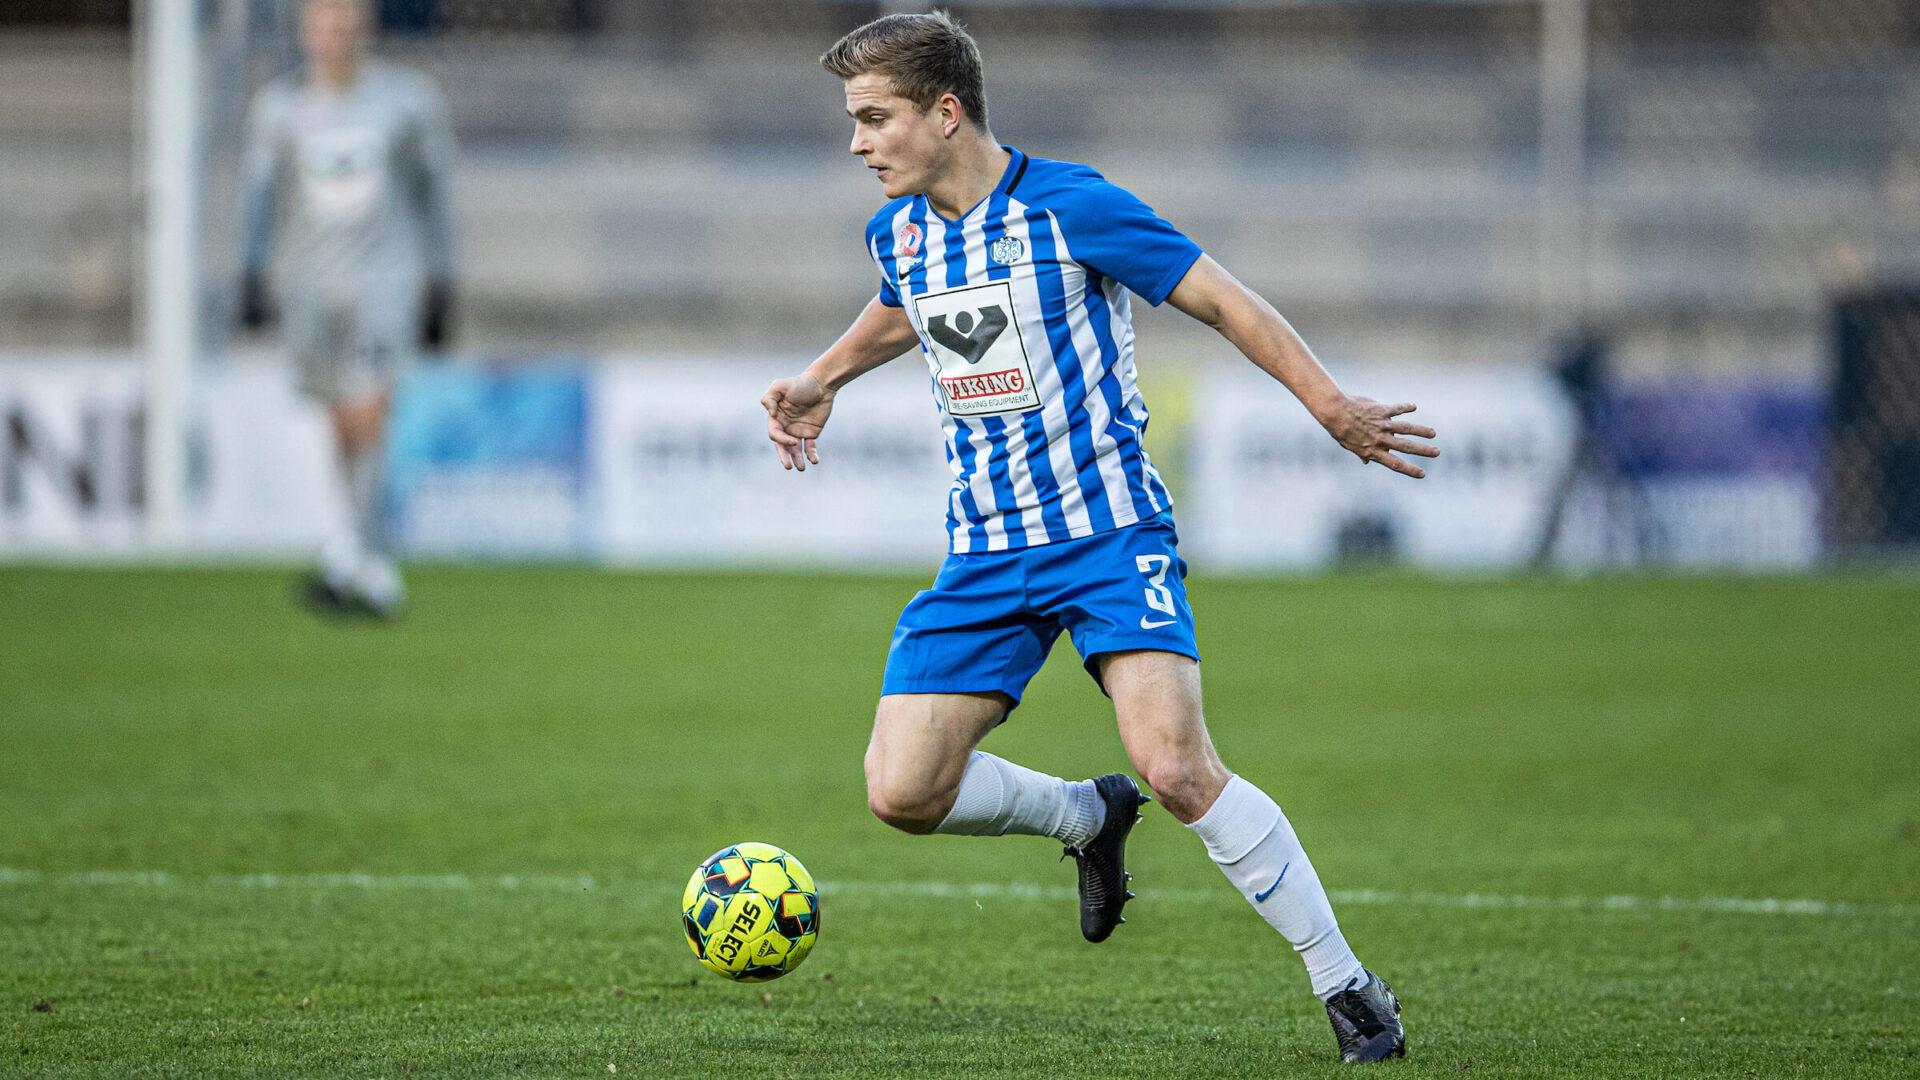 EfB forlænger med Simon Bækgård